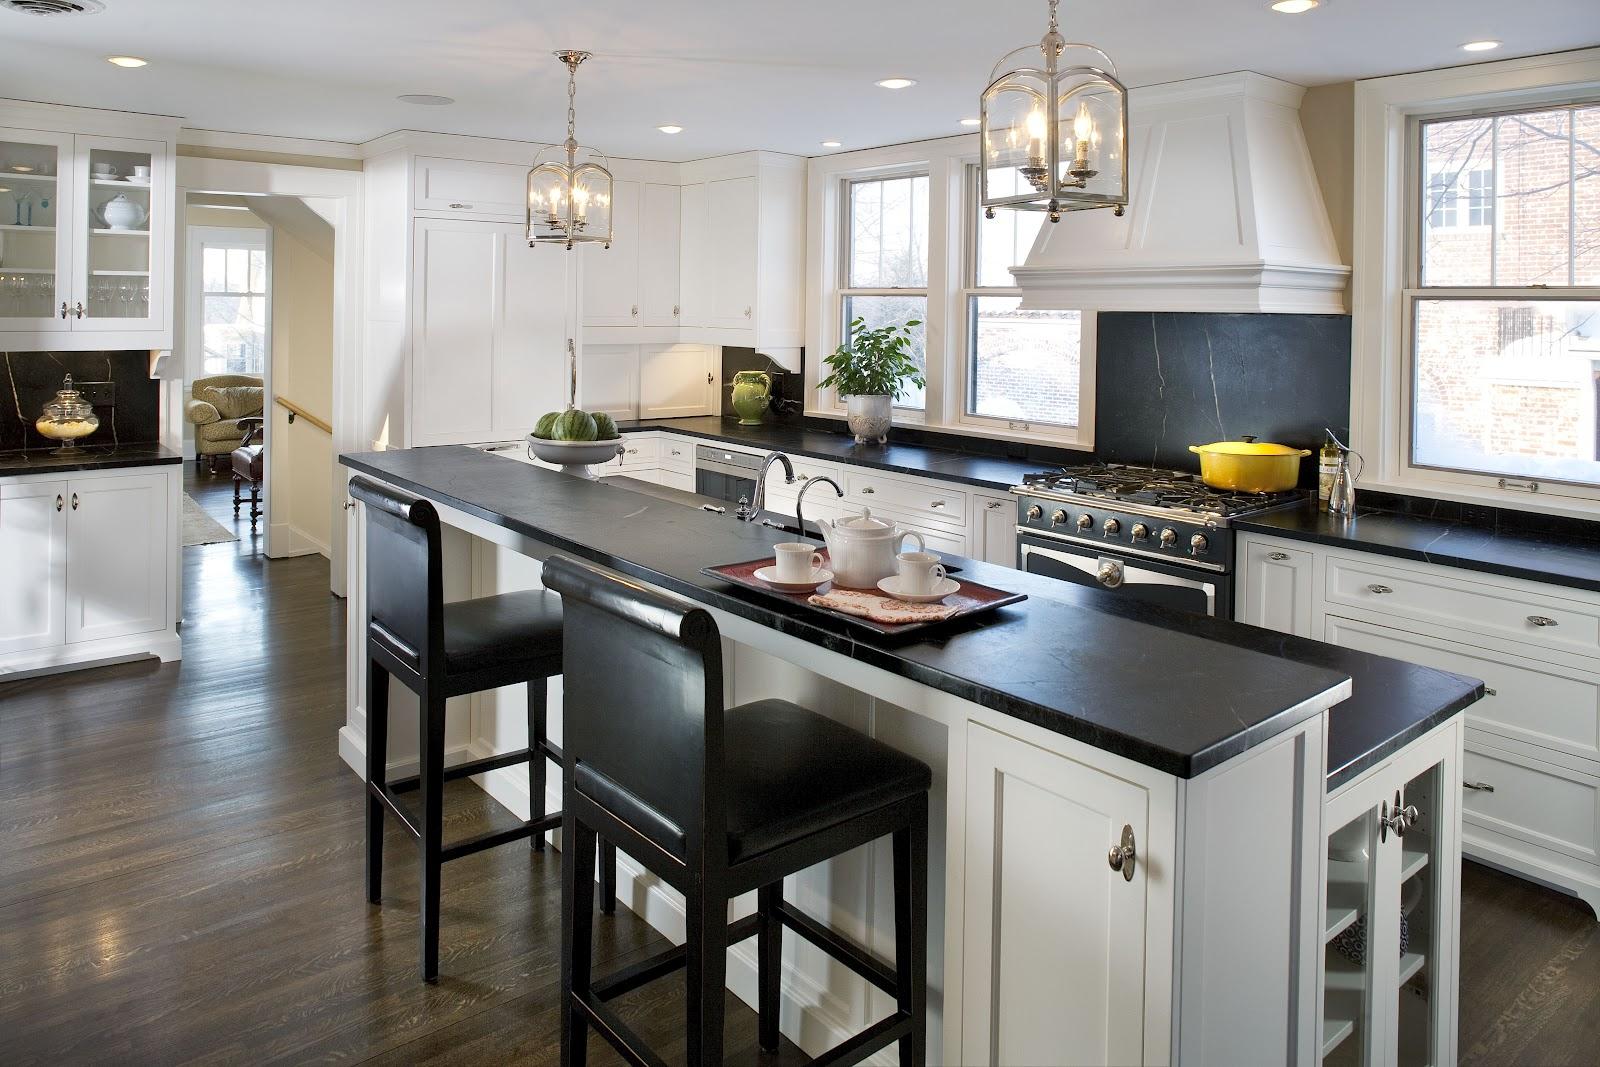 natural soapstone countertops soapstone kitchen countertops The Quick on Soapstone Countertops